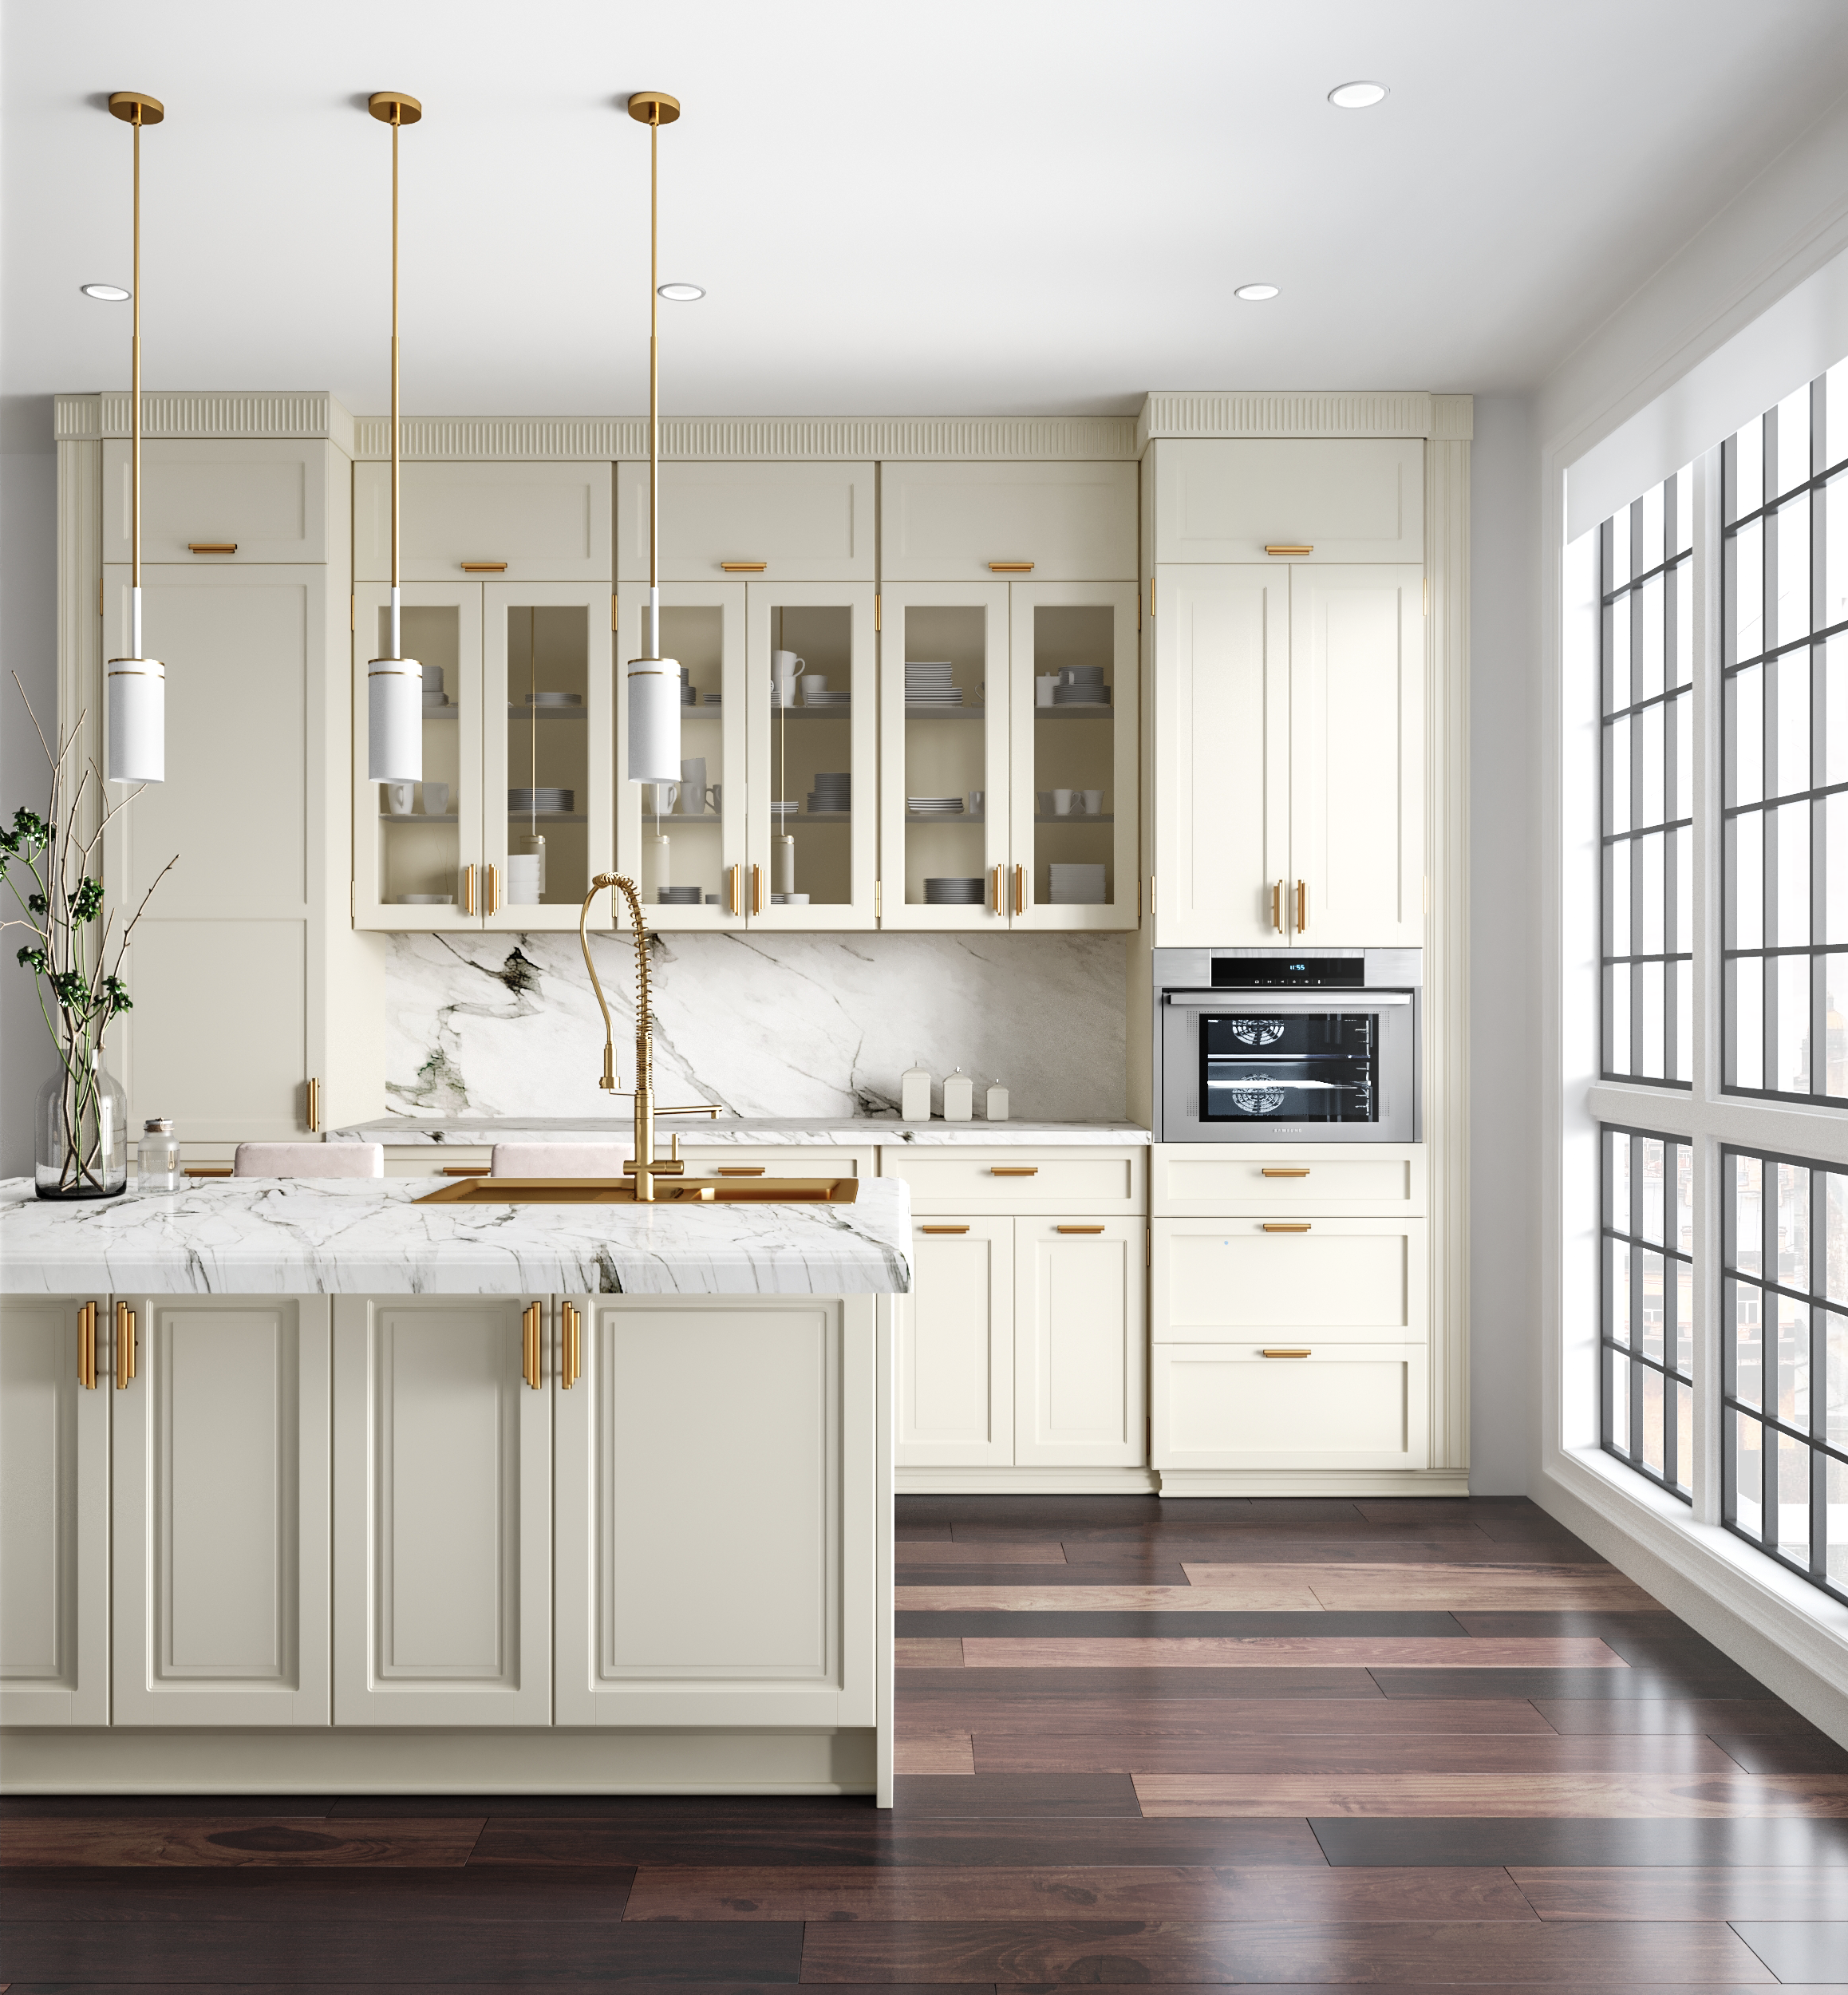 Кухня Any-Home KT007 - KT007 | AnyHome.ru